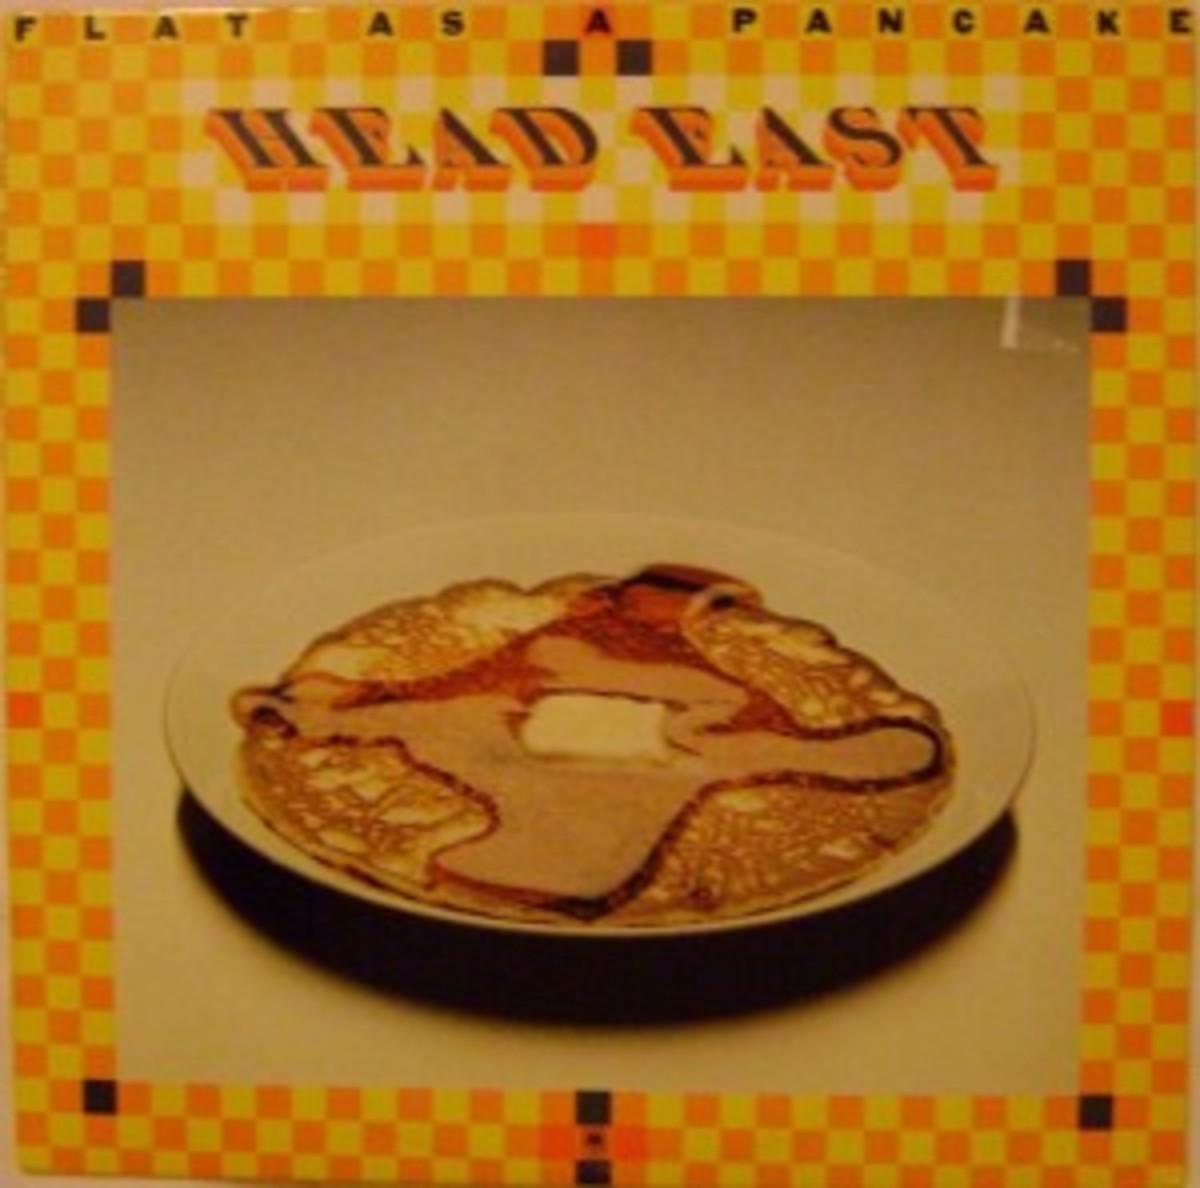 Head East Flat As A Pancake A&M